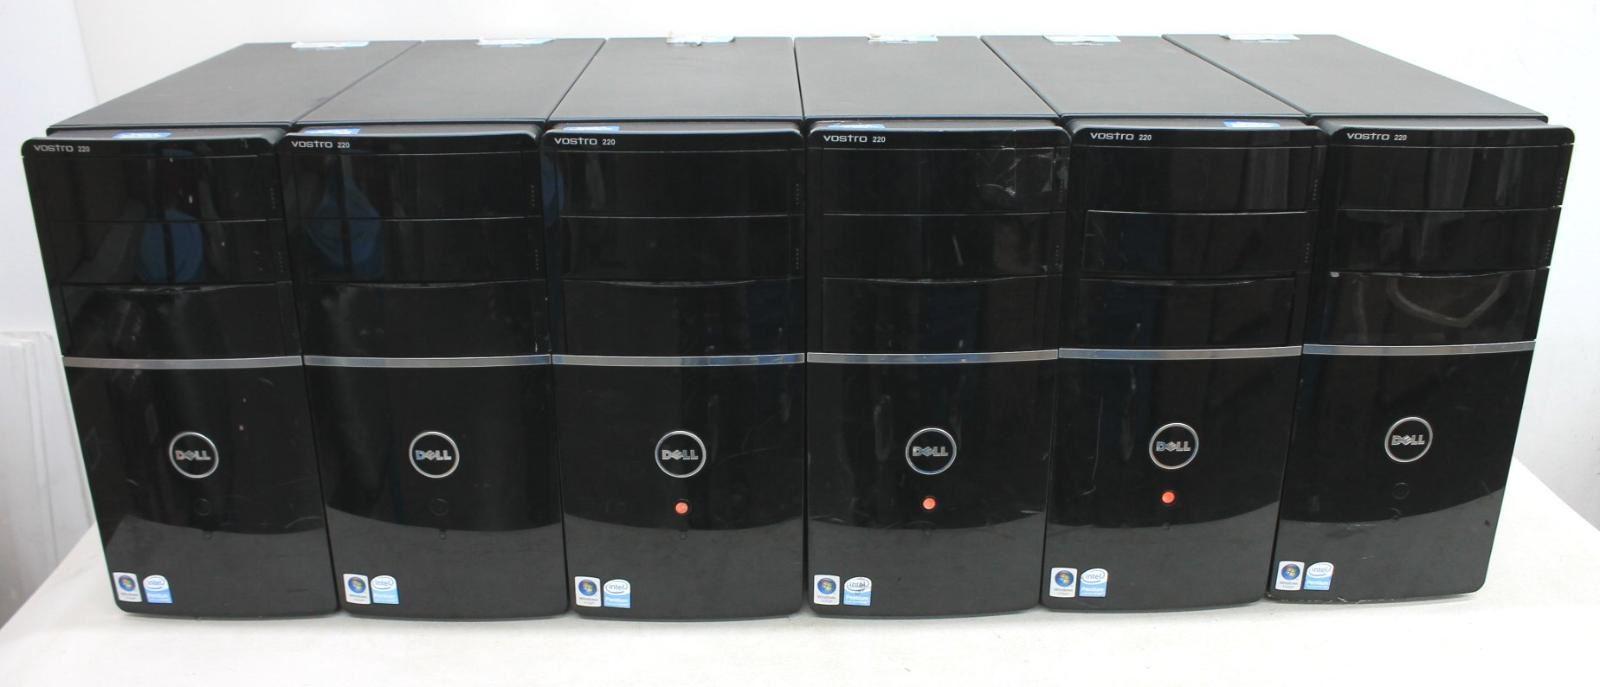 DELL-DC8CMF-Vostro-220-Intel-Pentium-E2200-2-20GHz-2GB-RAM-No-HDD-Desktops-6x